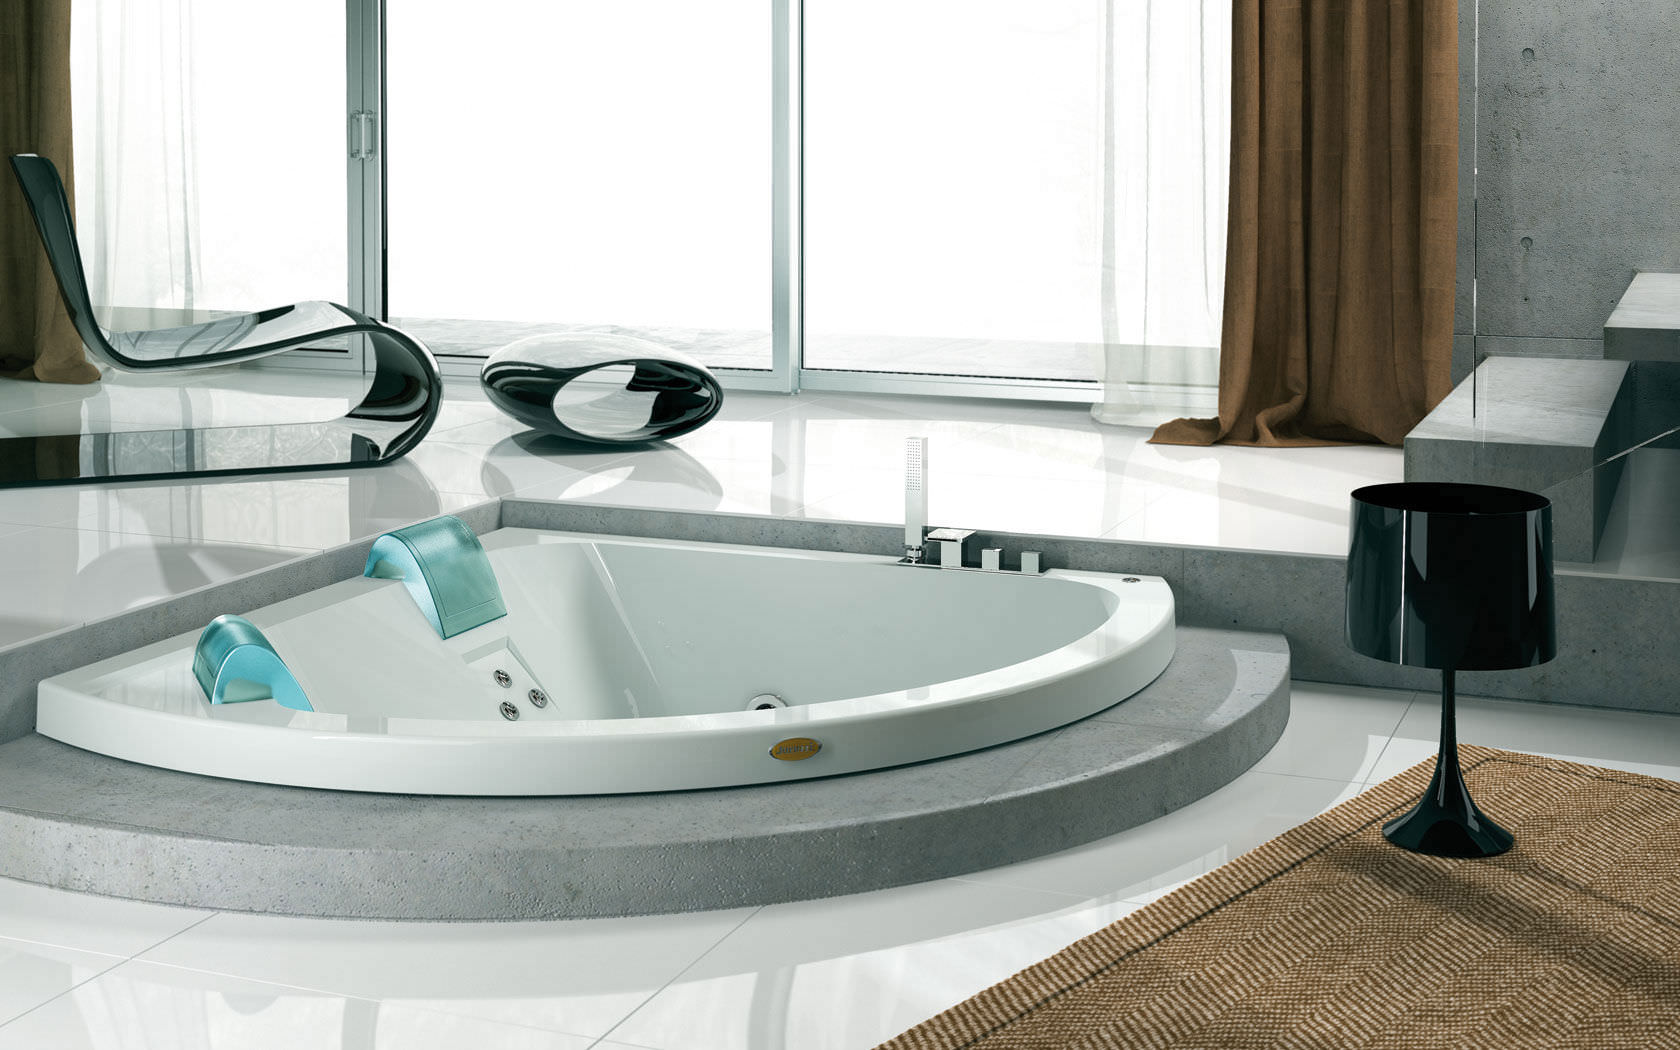 Угловая ванна встроенная